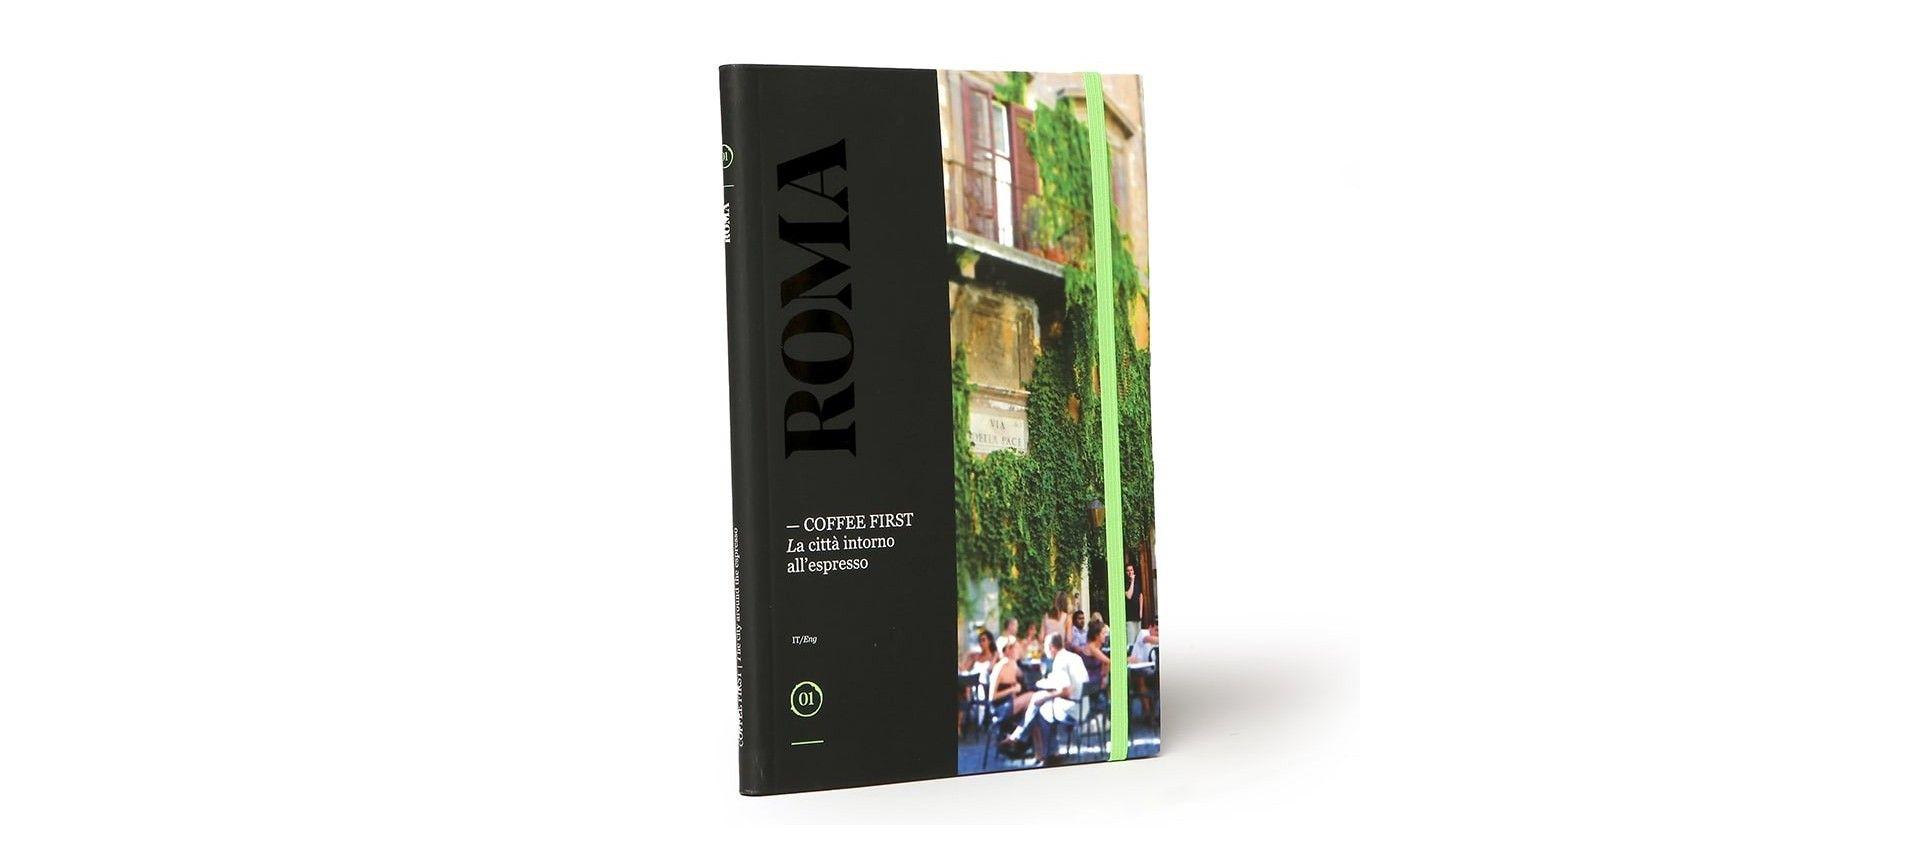 guida turistica roma coffee first